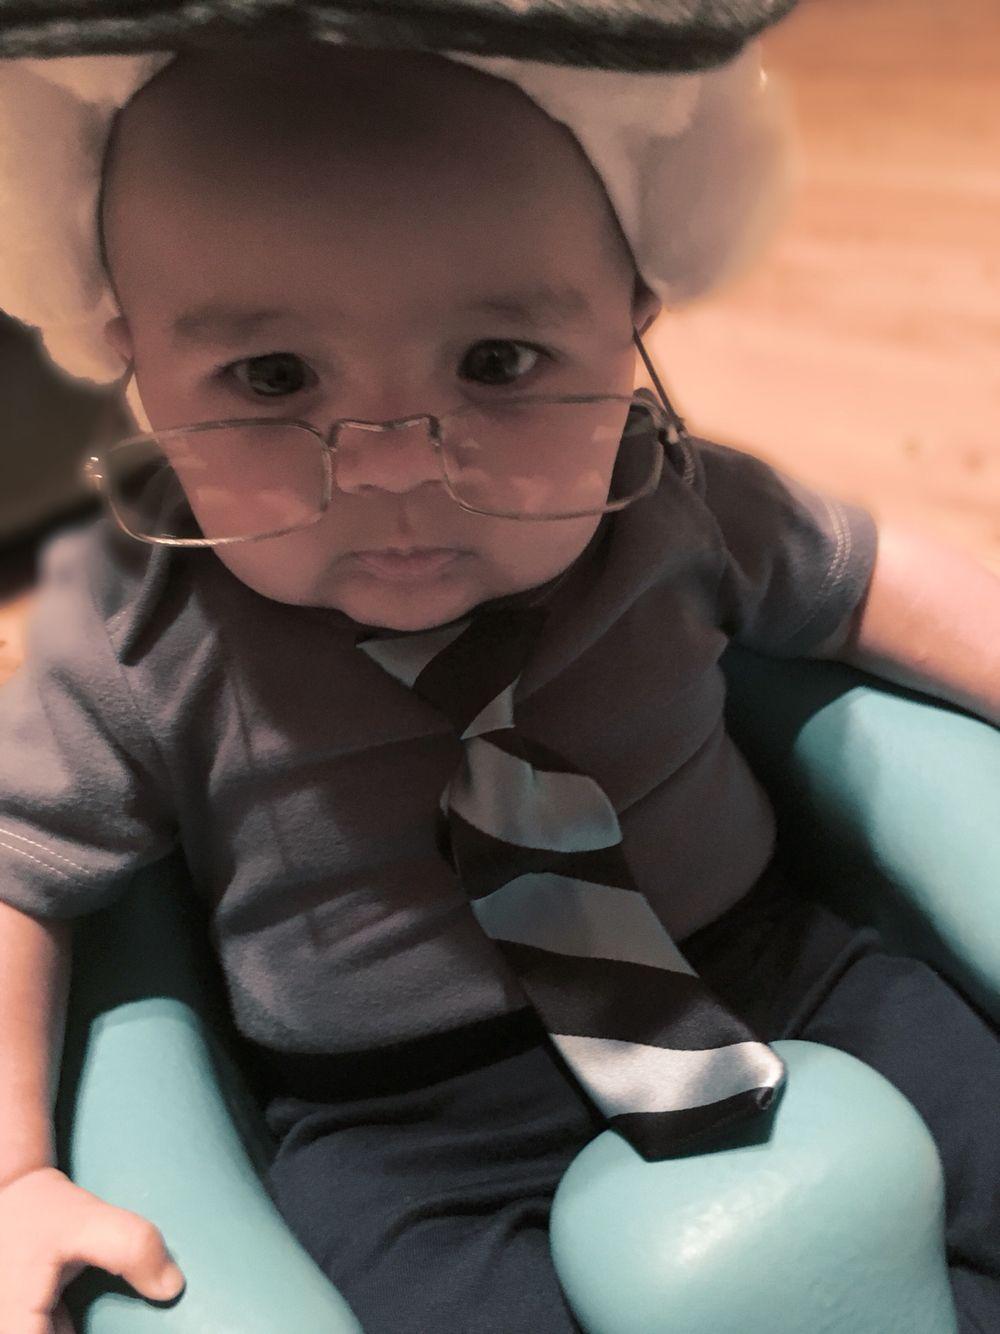 Old man costume for baby newborn infant  sc 1 st  Pinterest & Old man costume for baby newborn infant | Halloween | Pinterest ...